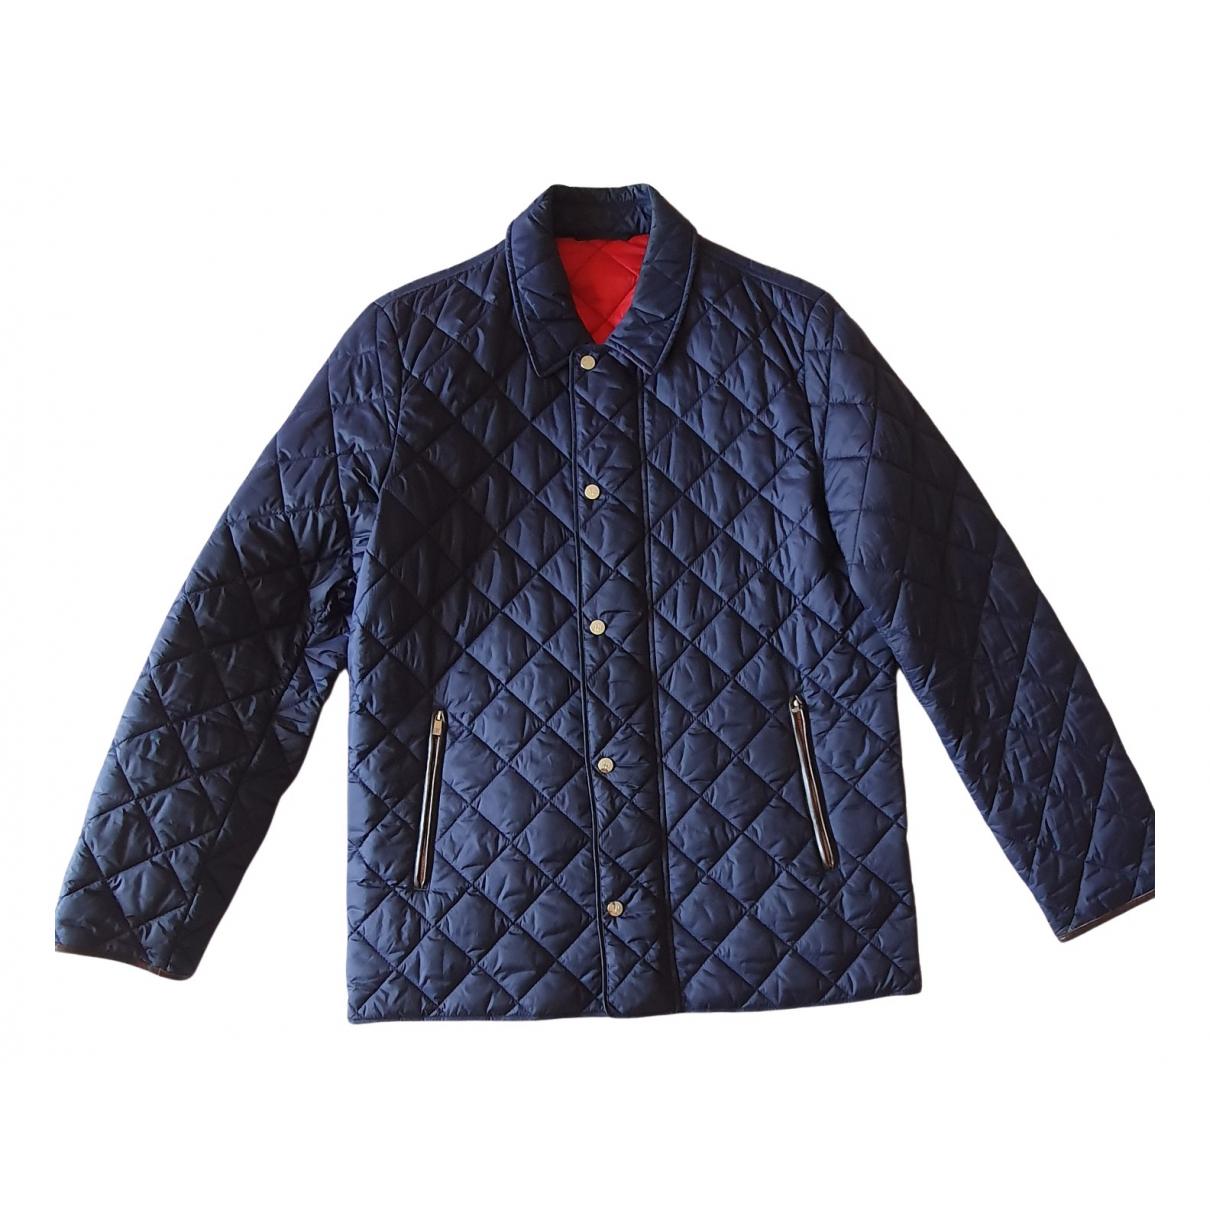 Carolina Herrera \N Navy jacket  for Men M International